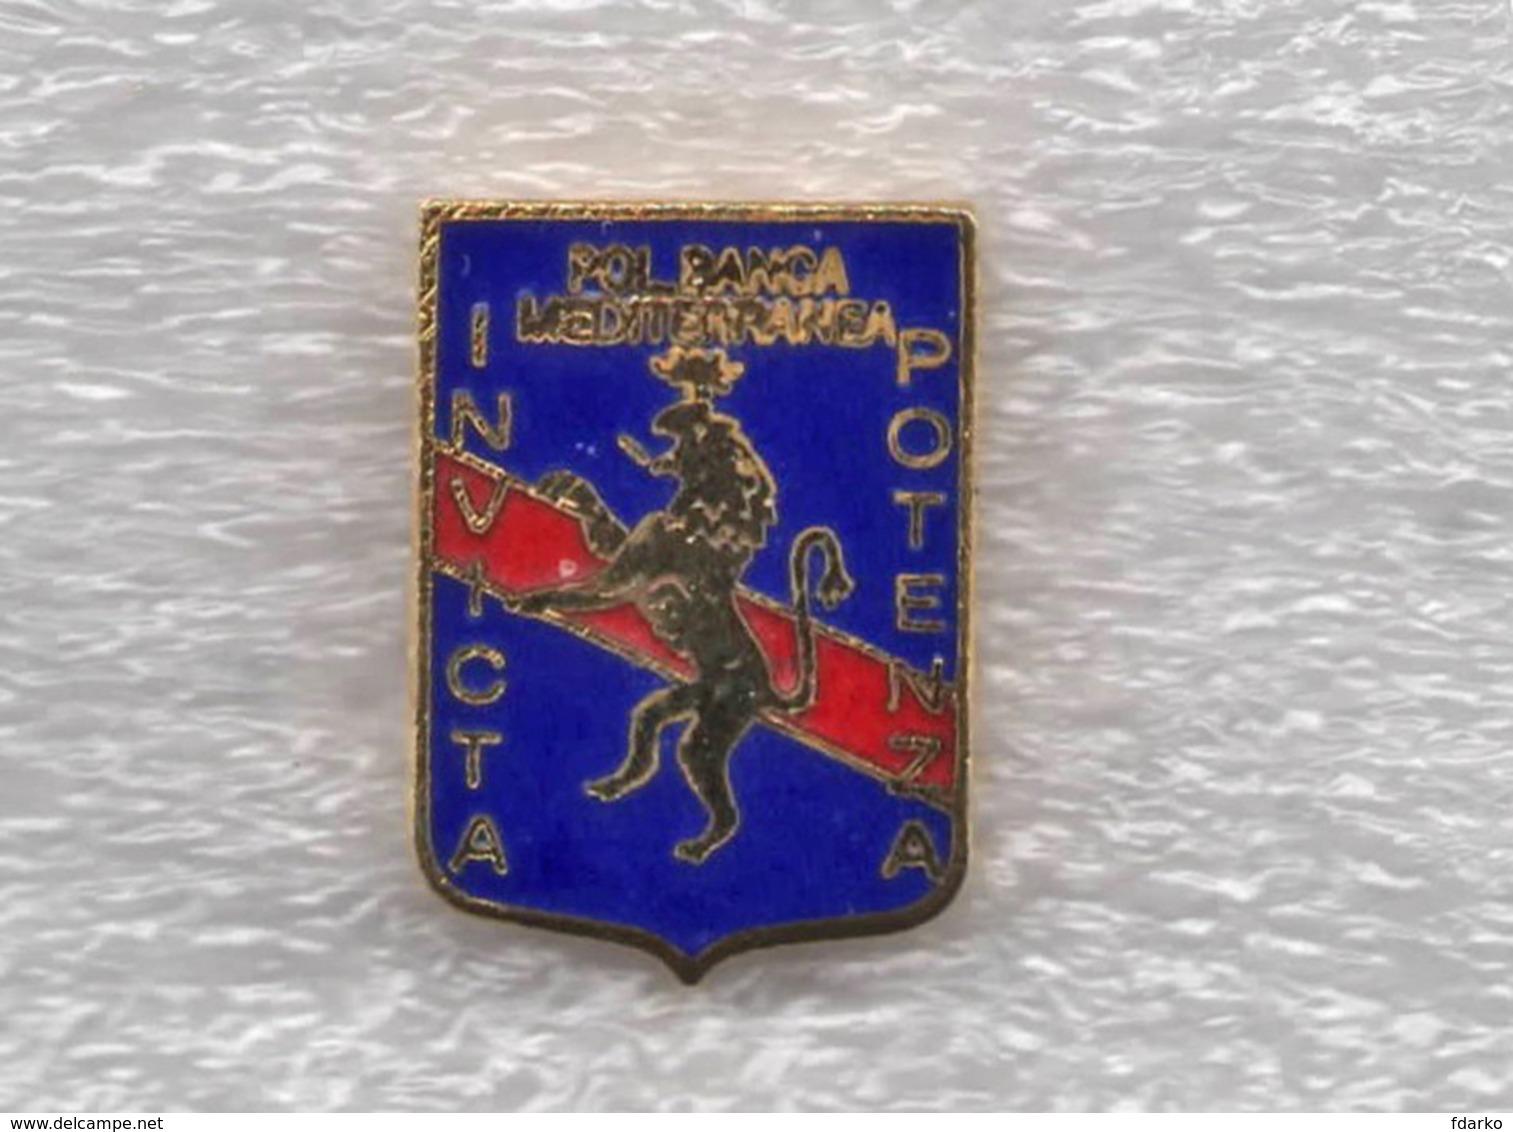 Pol. Banca Mediterranea Invicta Potenza Calcio Rossoblu Distintivi FootBall Soccer Pins Spilla Italy - Calcio